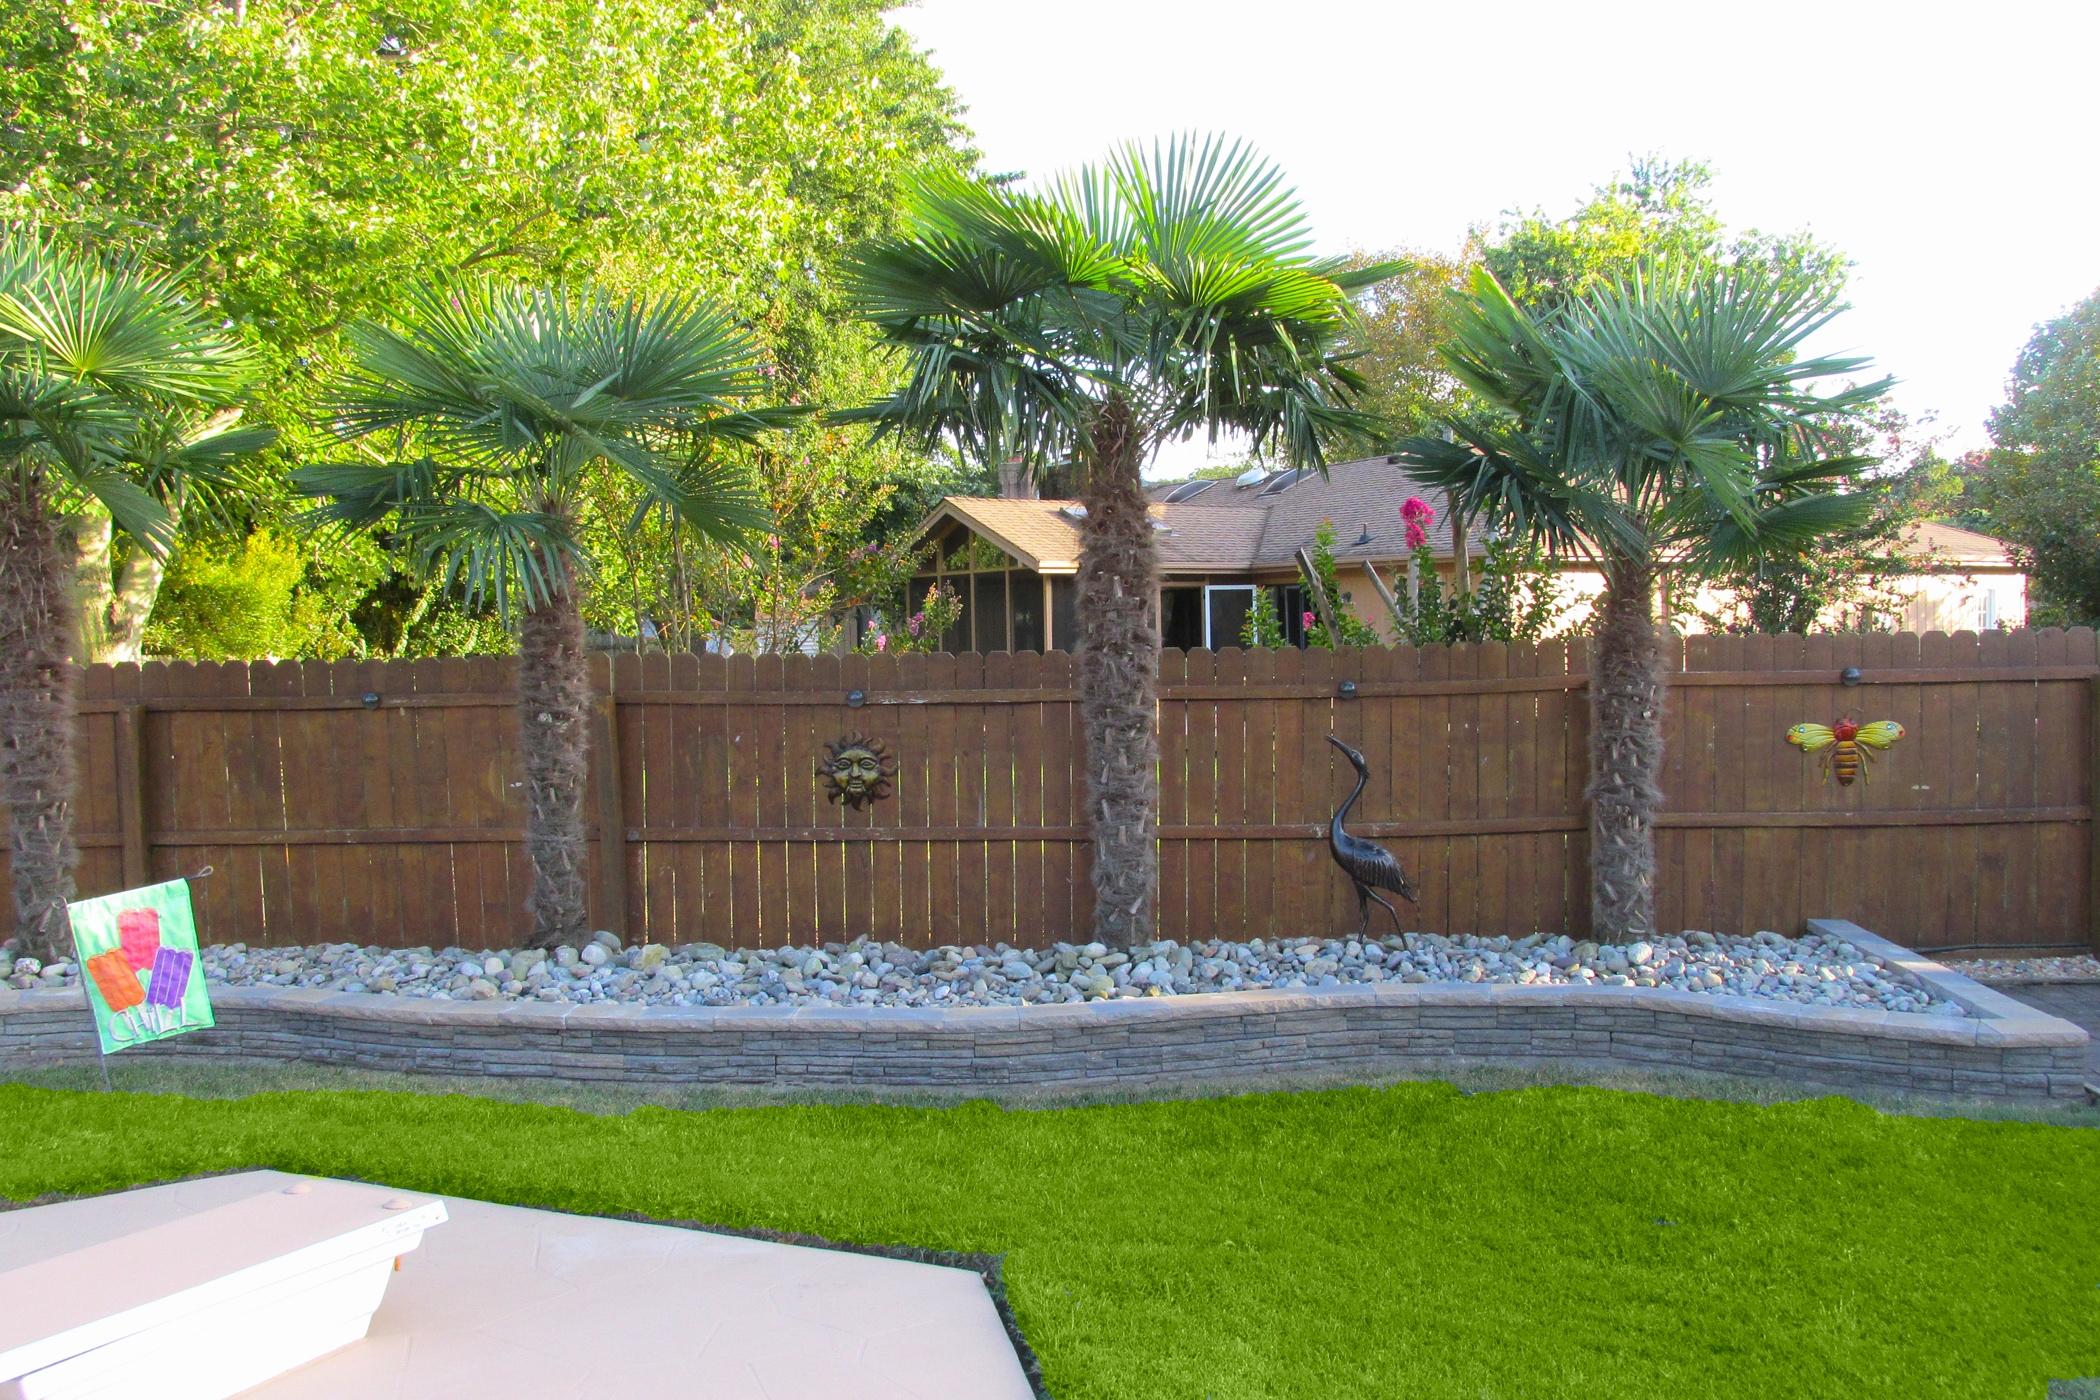 Beautiful Backyard Ideas With Palm Trees | Decor & Design ... on Palm Tree Backyard Ideas id=68788